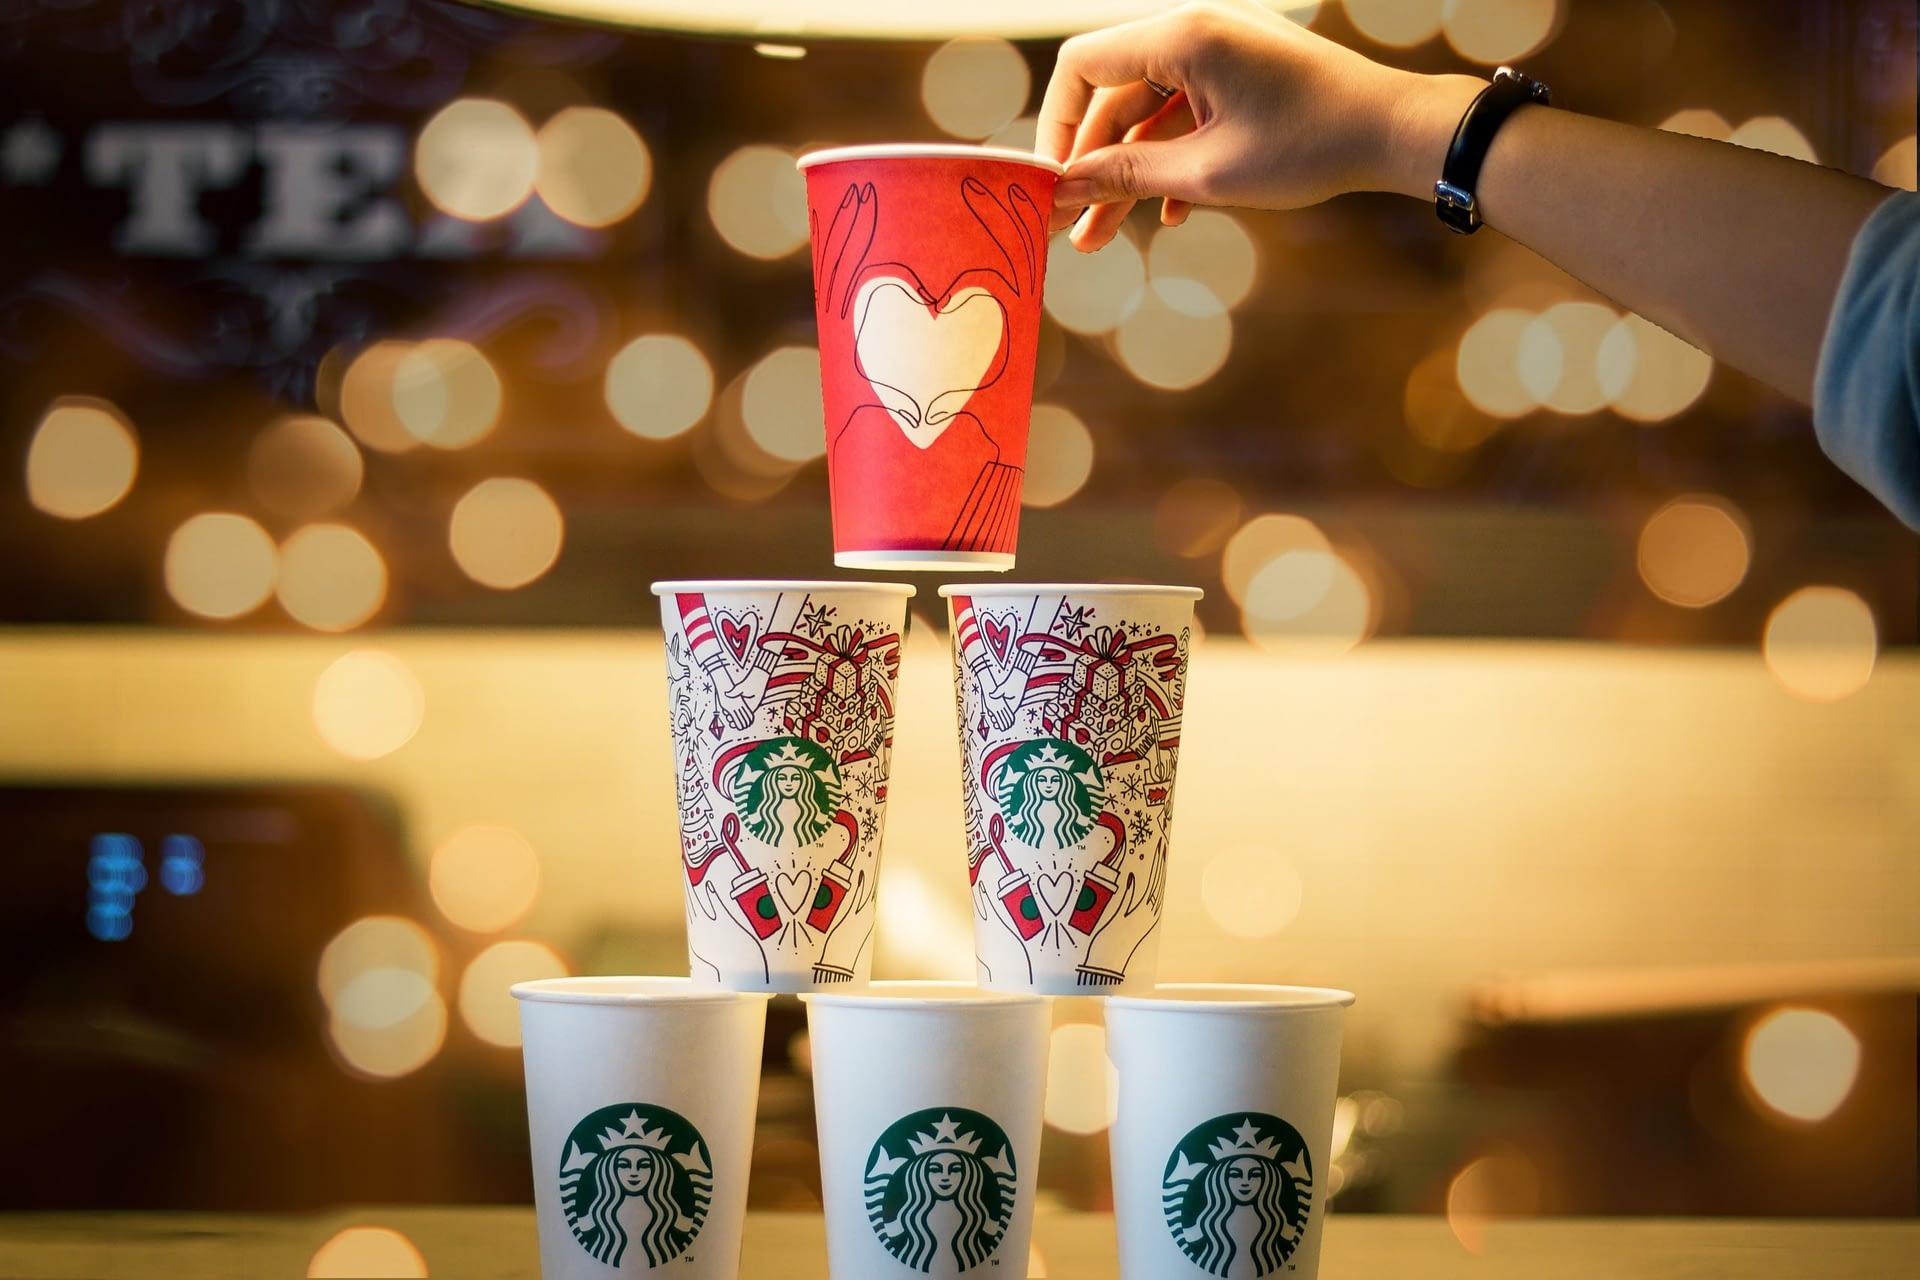 The Starbucks cups